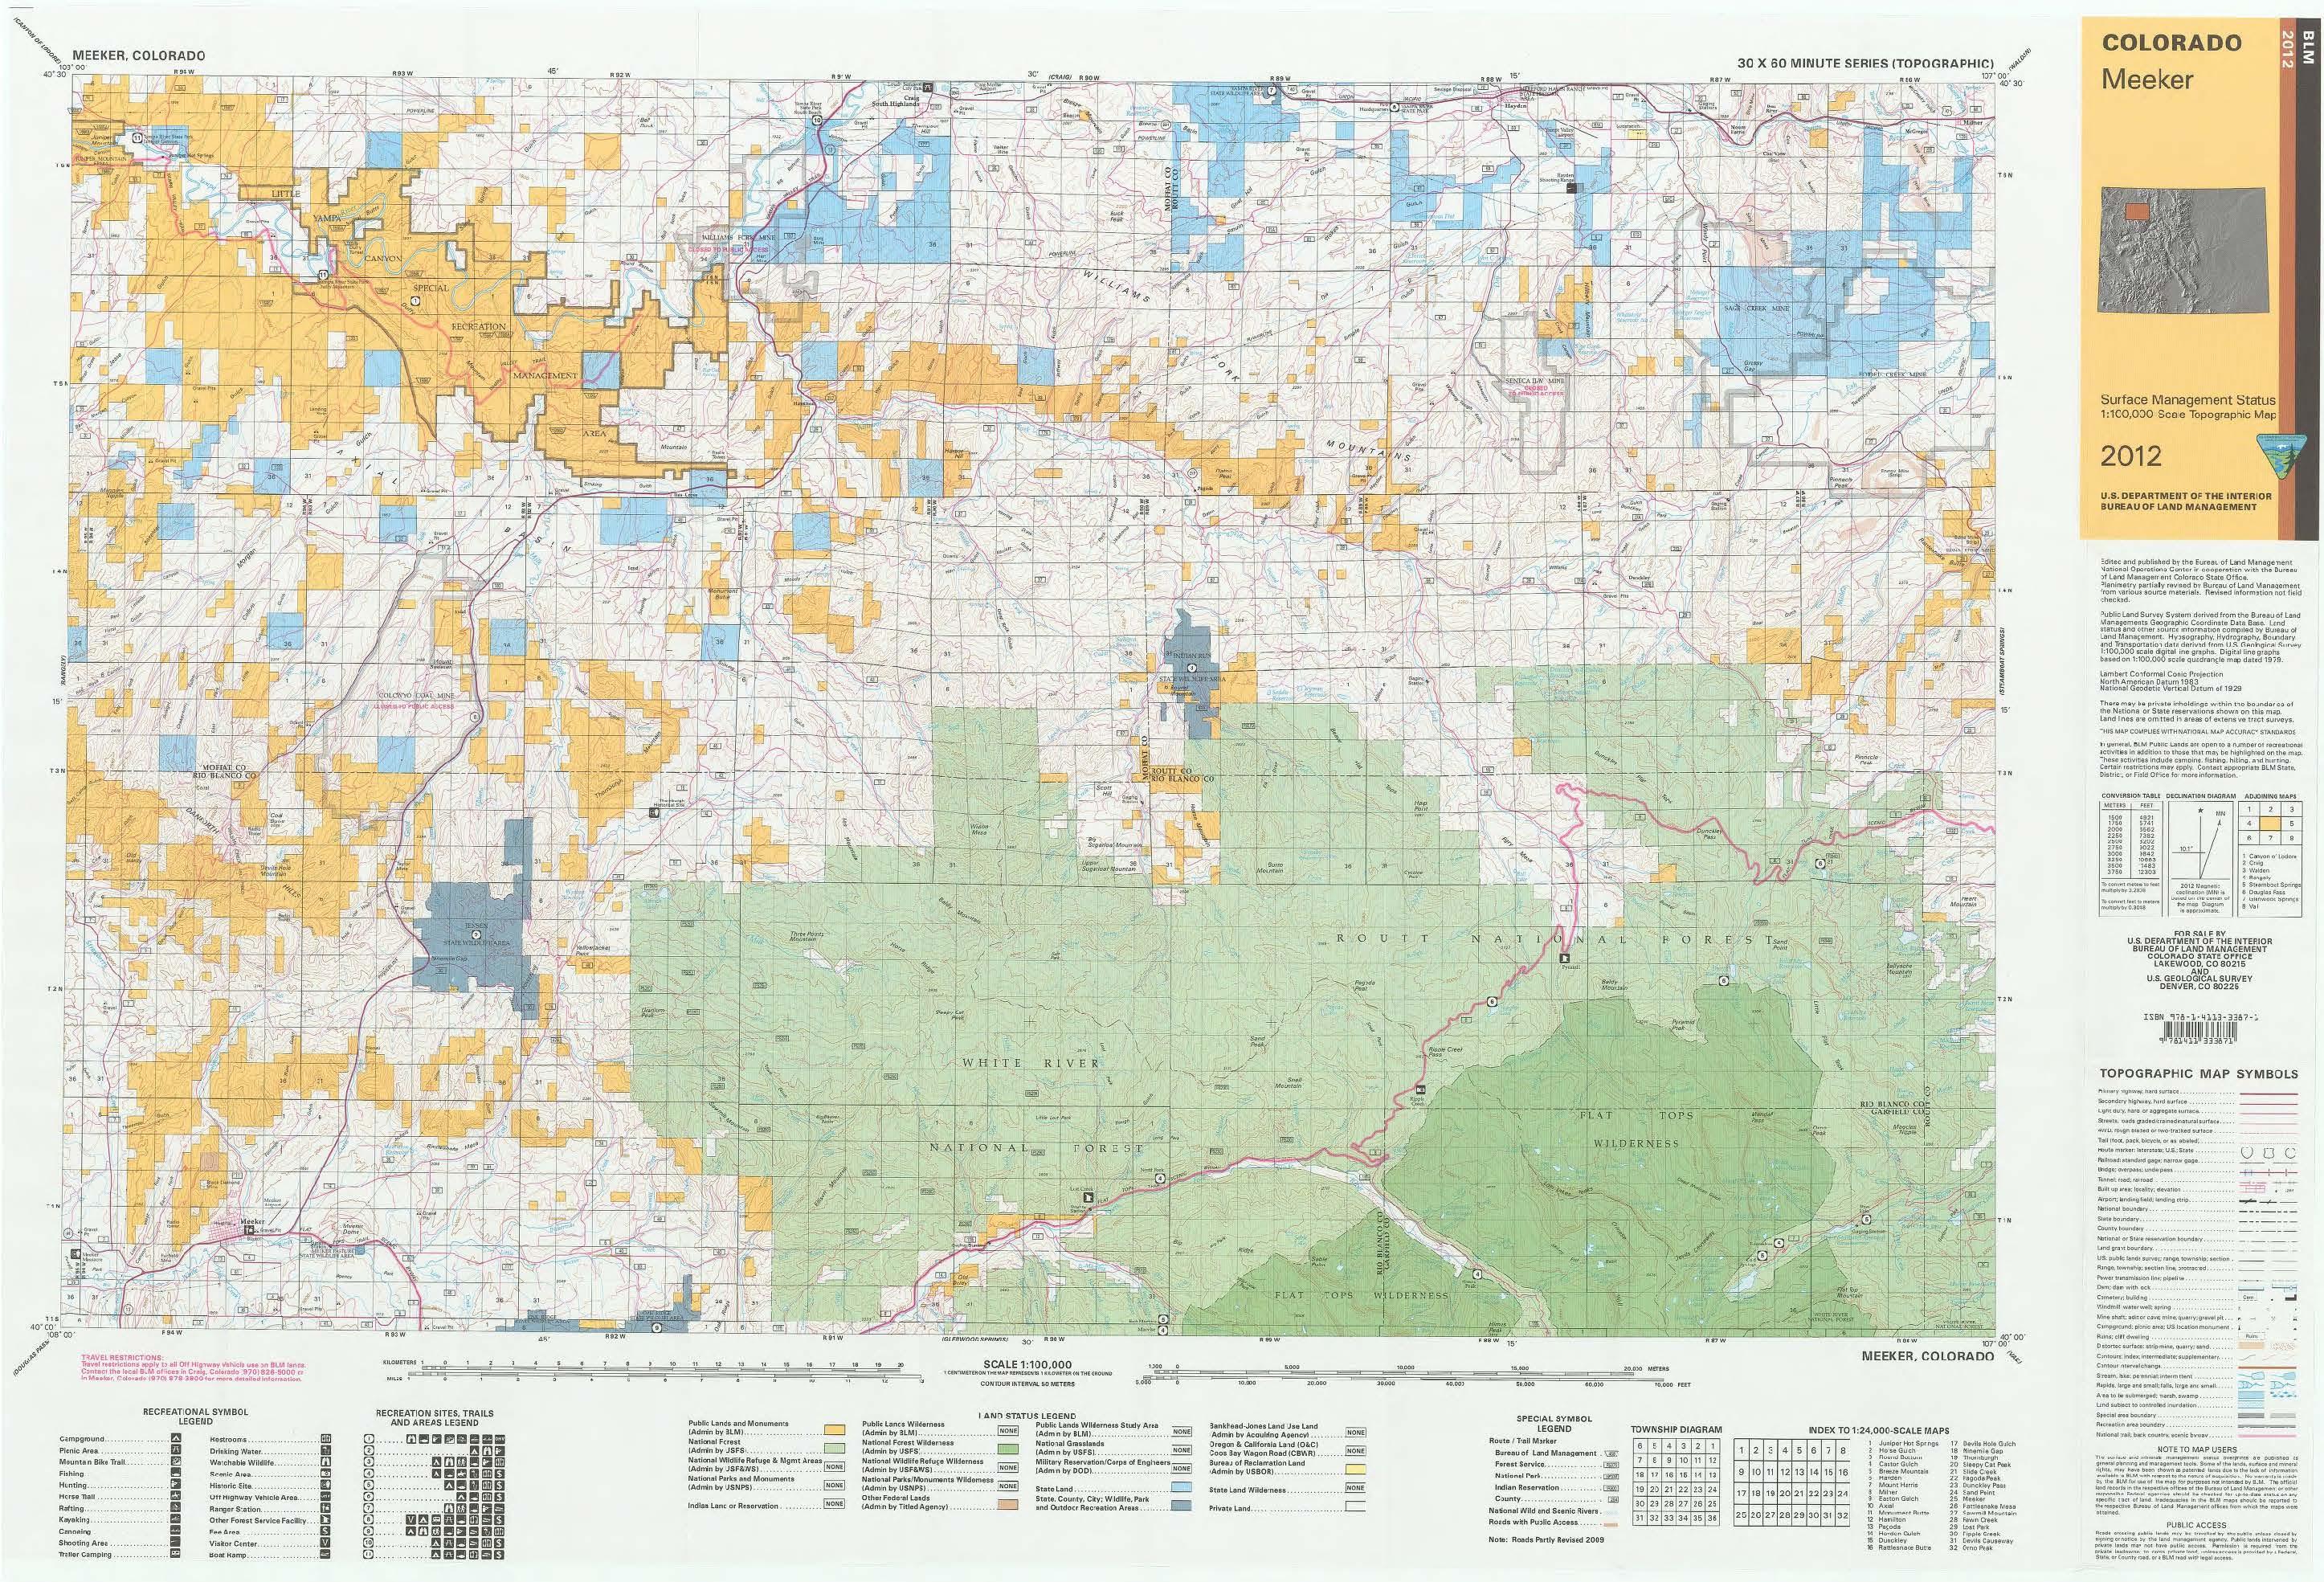 CO Surface Management Status Meeker Map | Bureau of Land Management